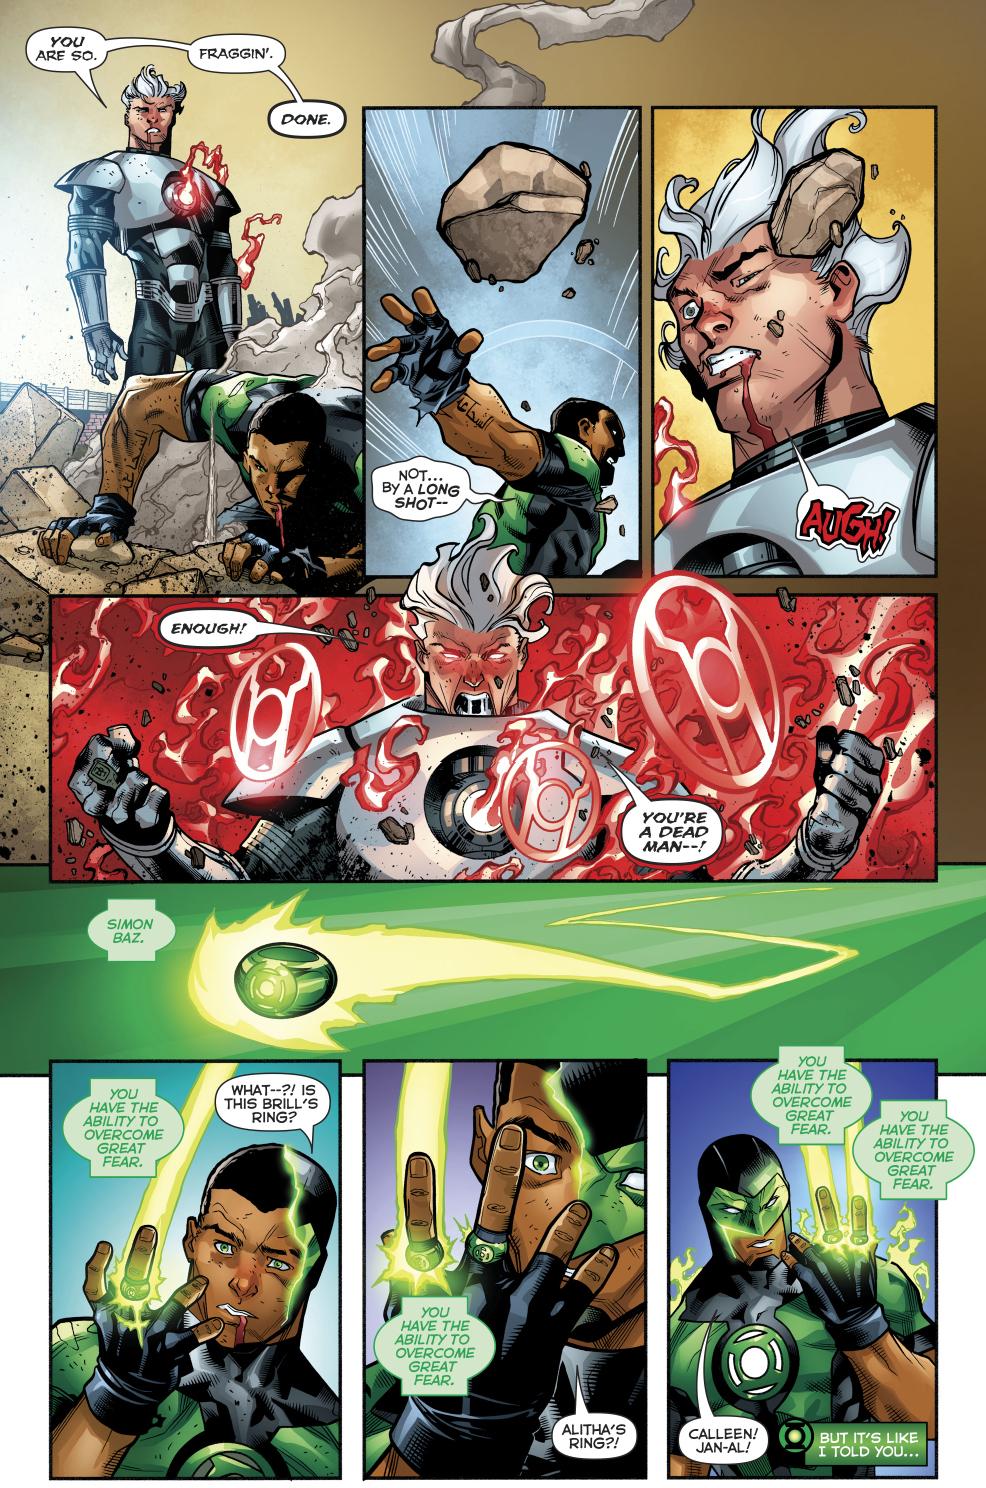 Simon Baz Earns 4 Green Lantern Rings